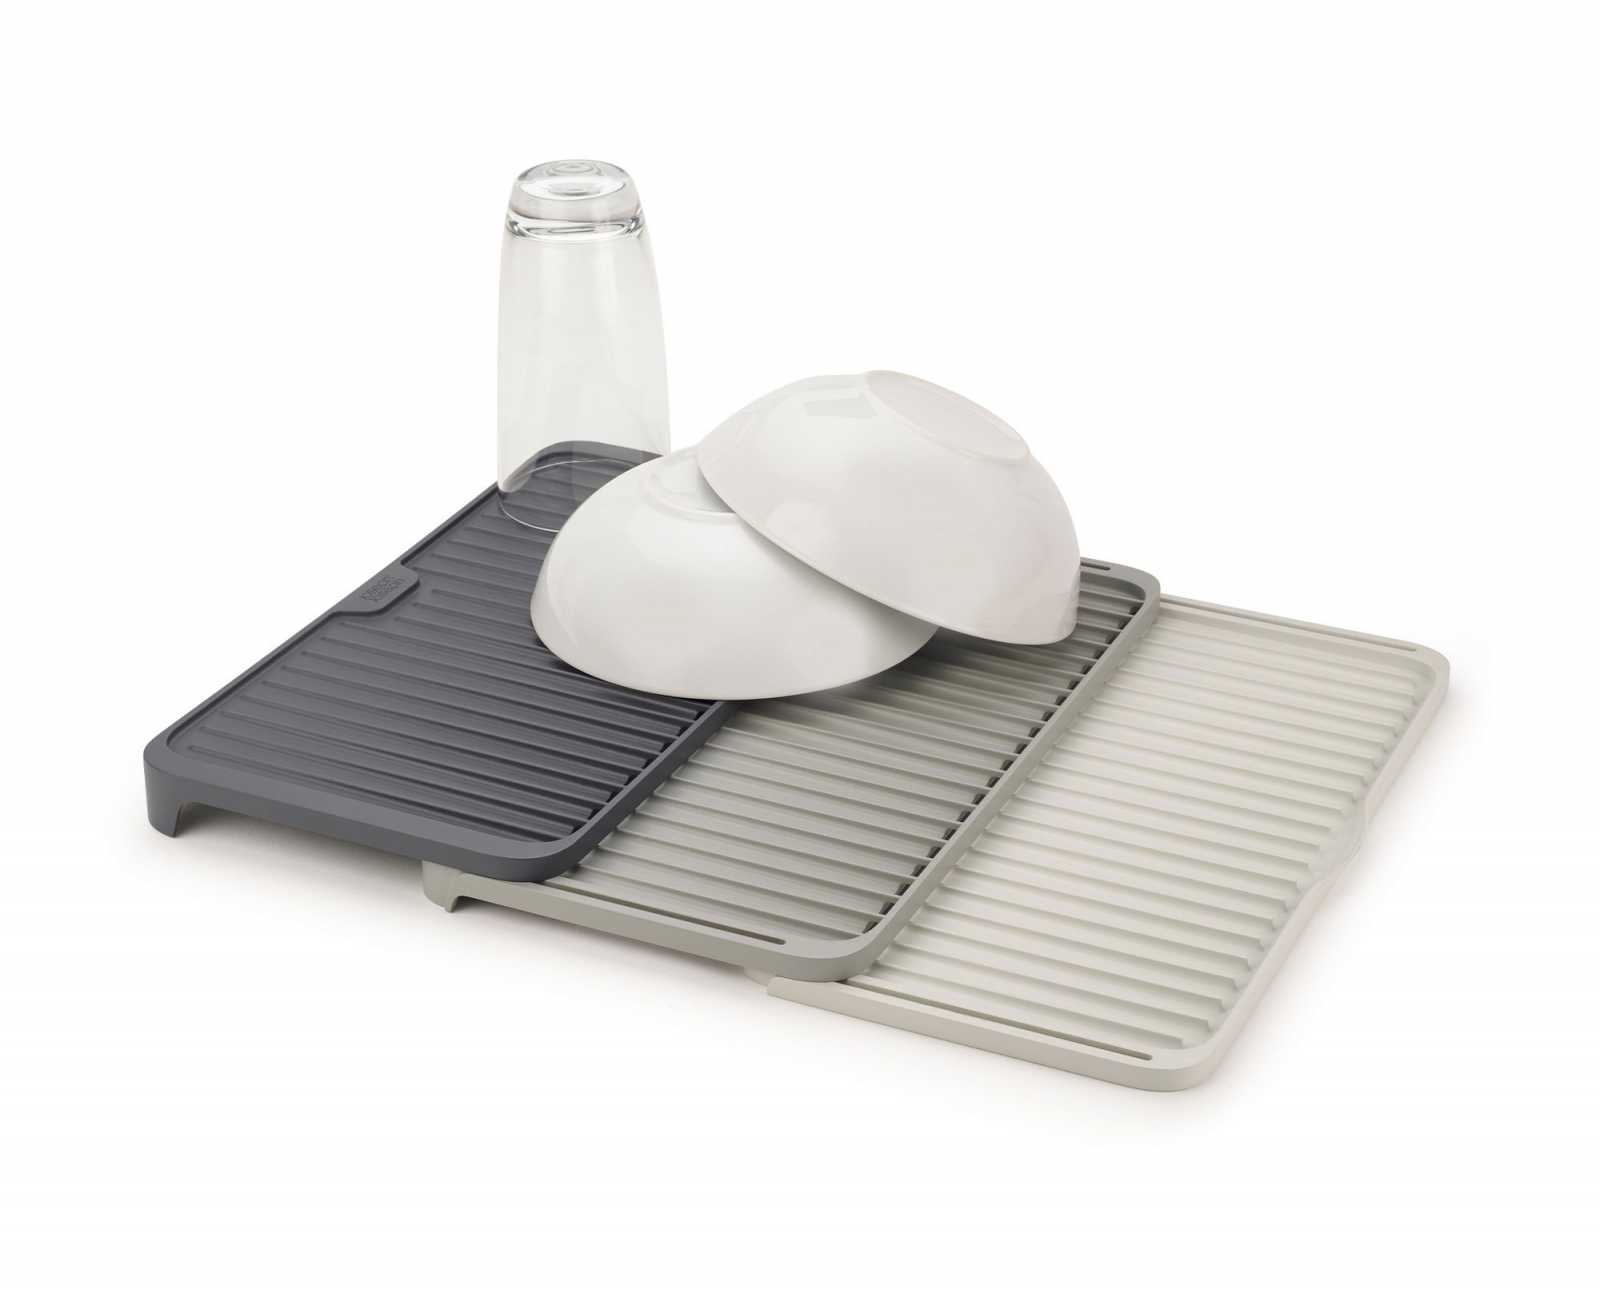 Онлайн каталог PROMENU: Коврик для сушки посуды раскладной Joseph Joseph Tier™, серый Joseph Joseph 85178